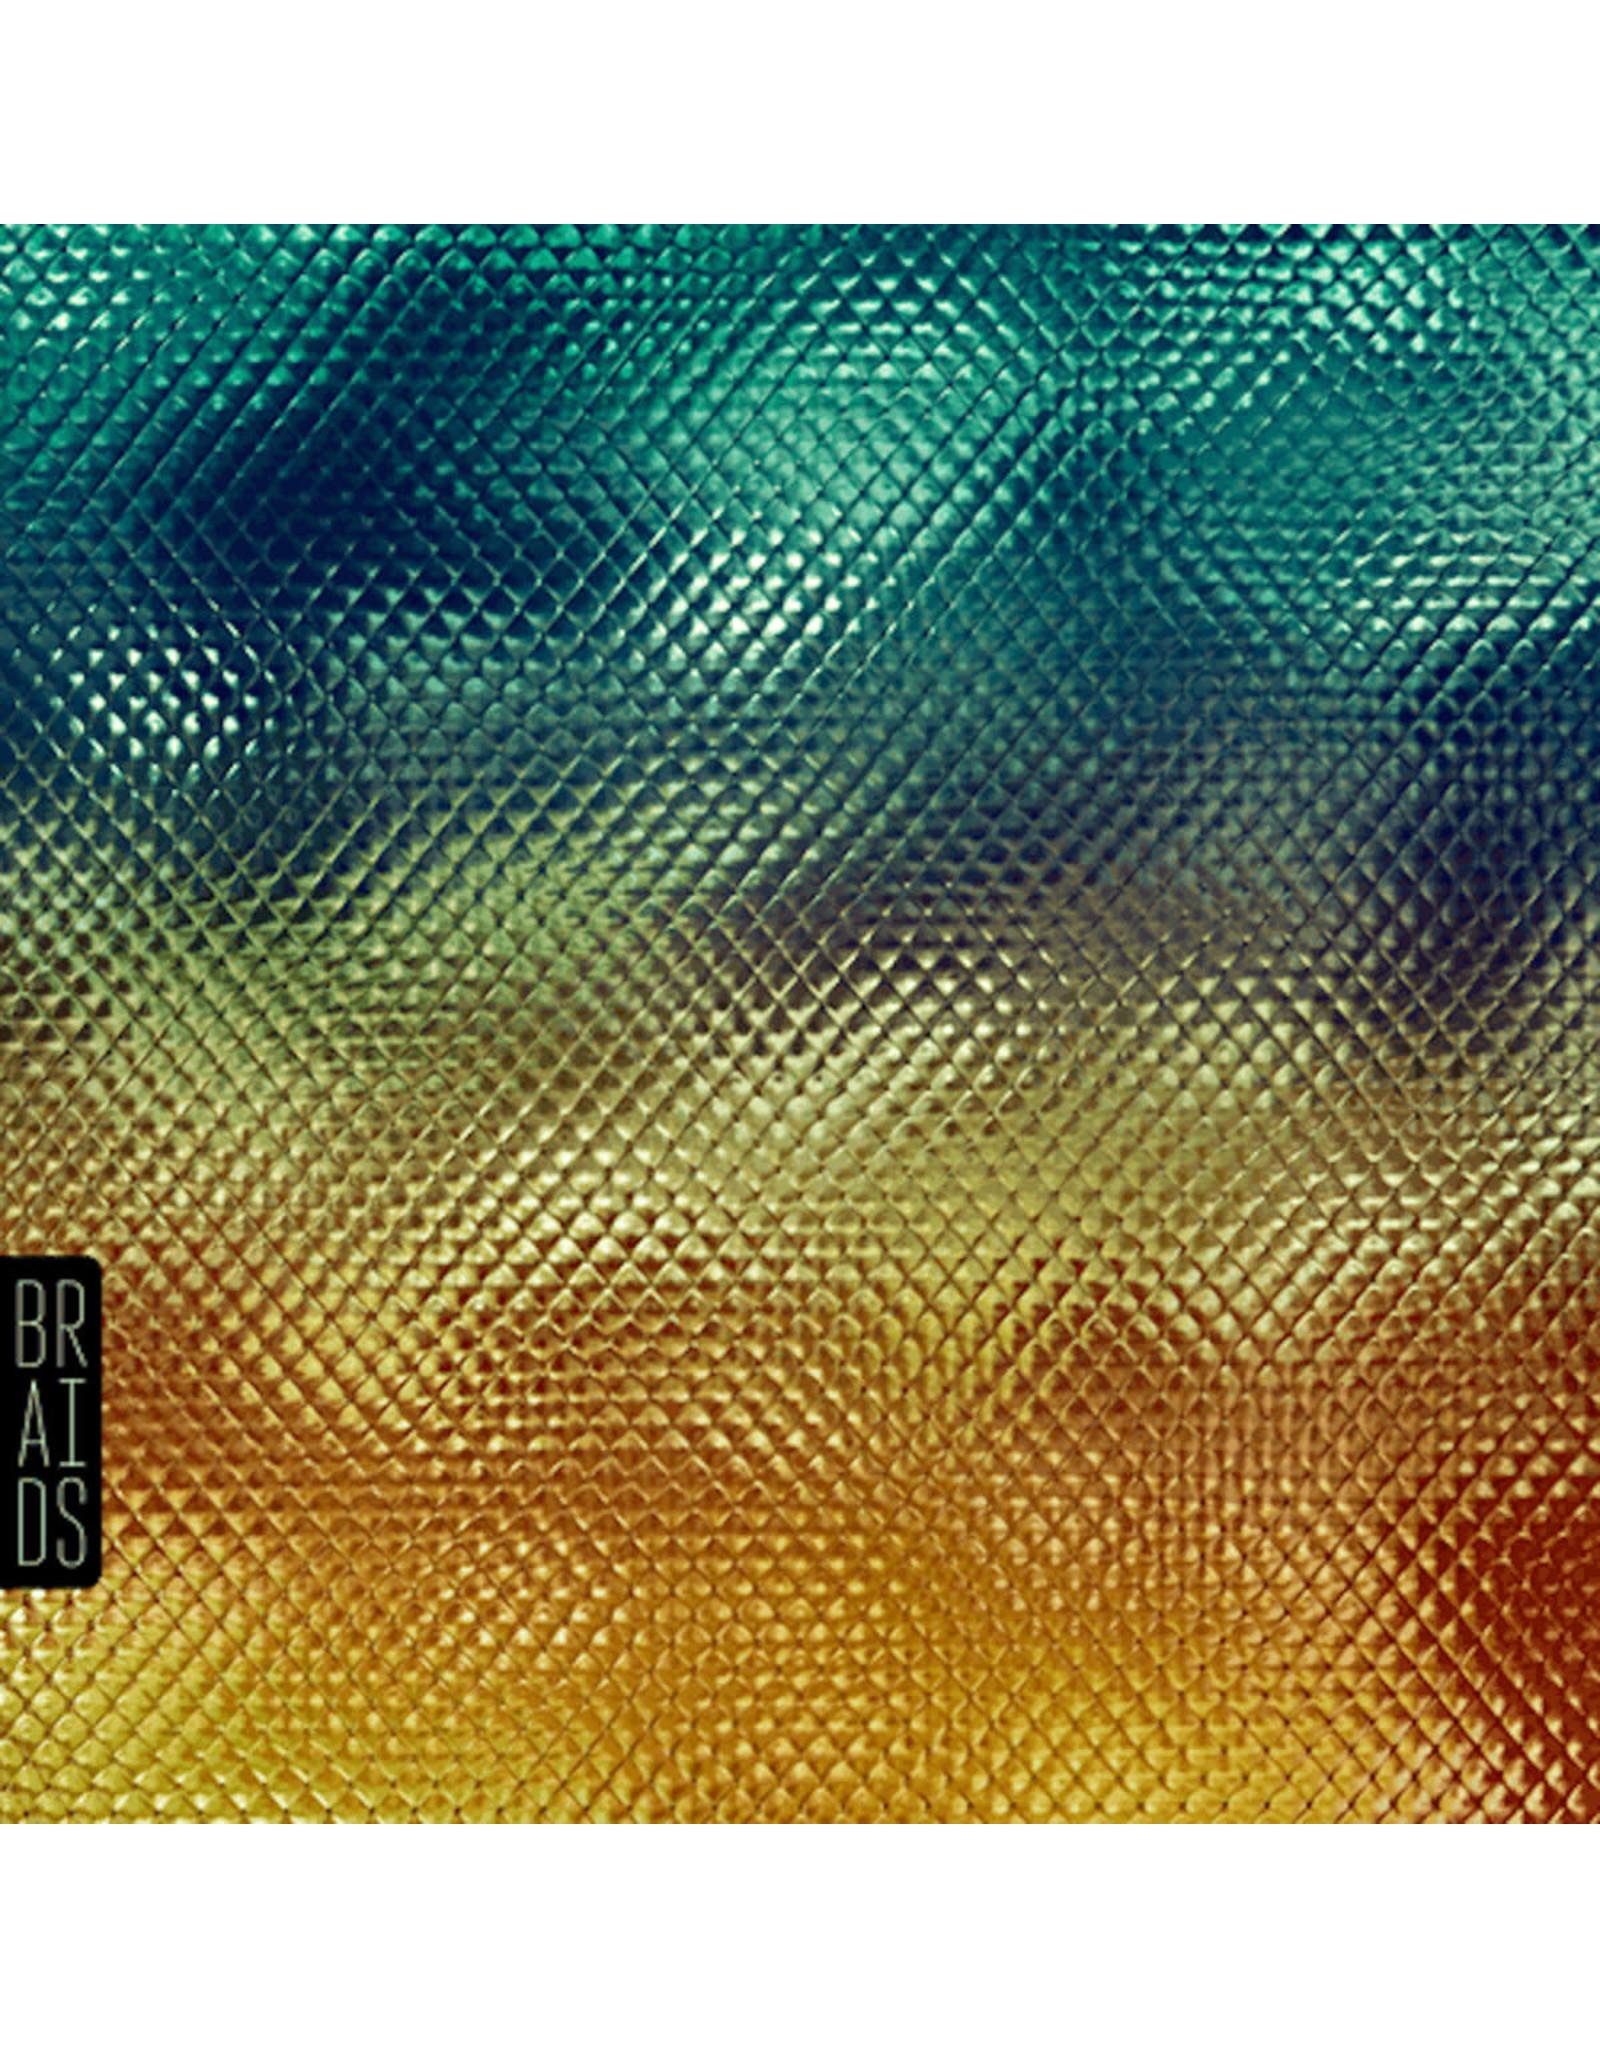 Braids - Native Speaker LP (10th Anniversary Coloured Edition)